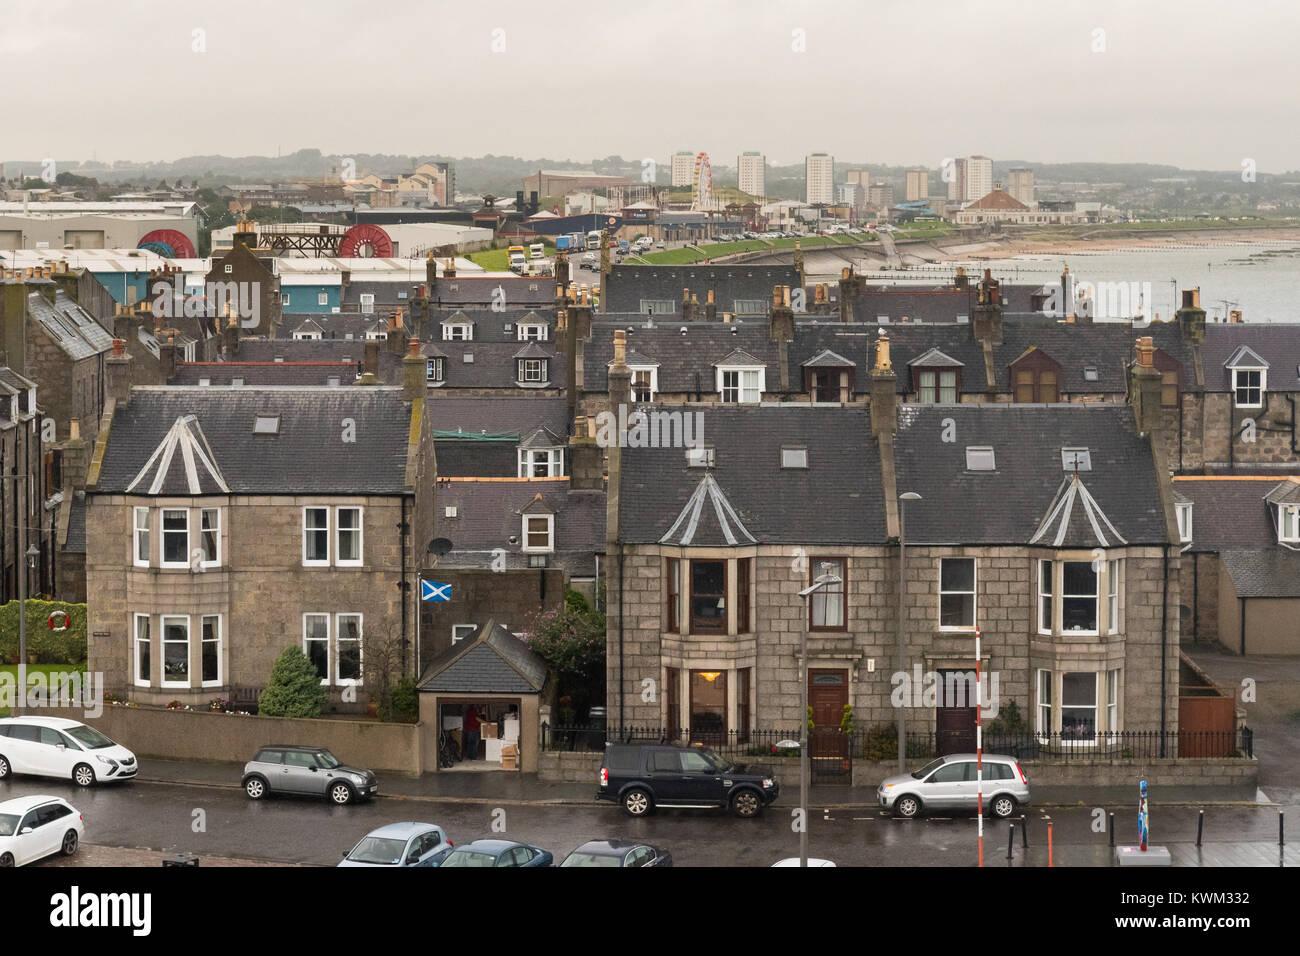 Casas en Aberdeen Pocra Quay en el área de conservación Footdee, Aberdeen, Escocia, Reino Unido Imagen De Stock